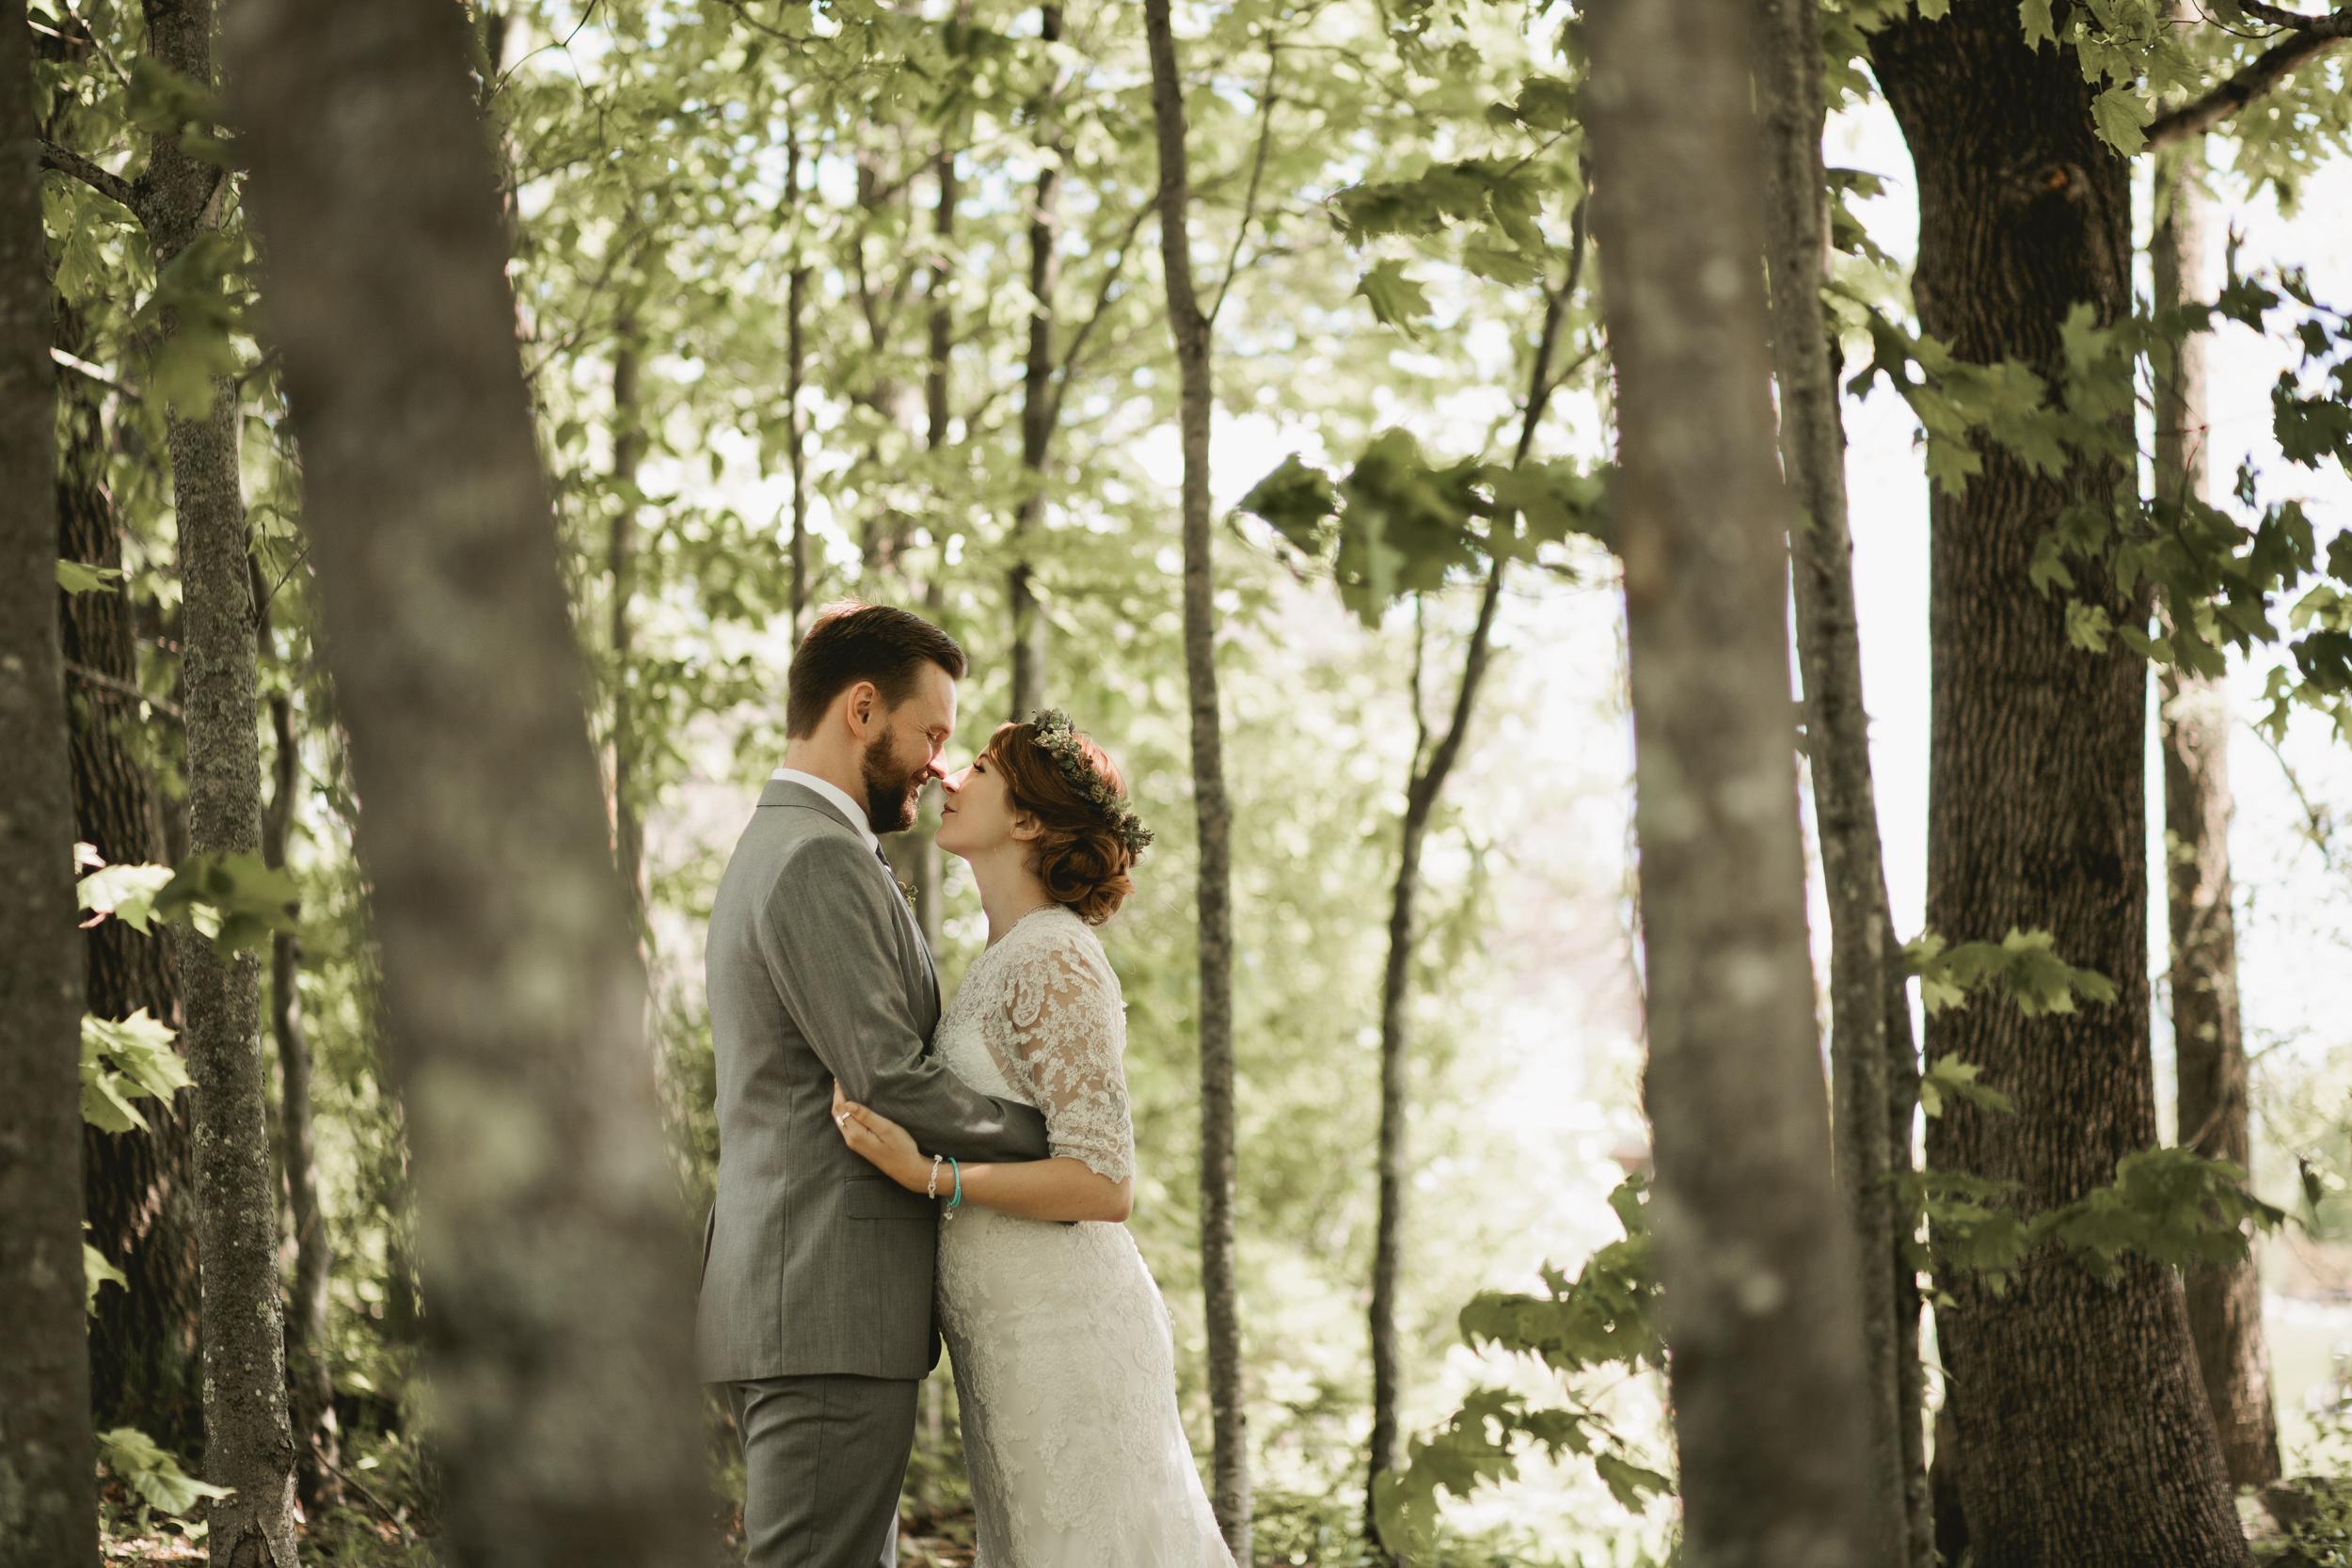 Spring-Meadows-Maine-Wedding-116.jpg